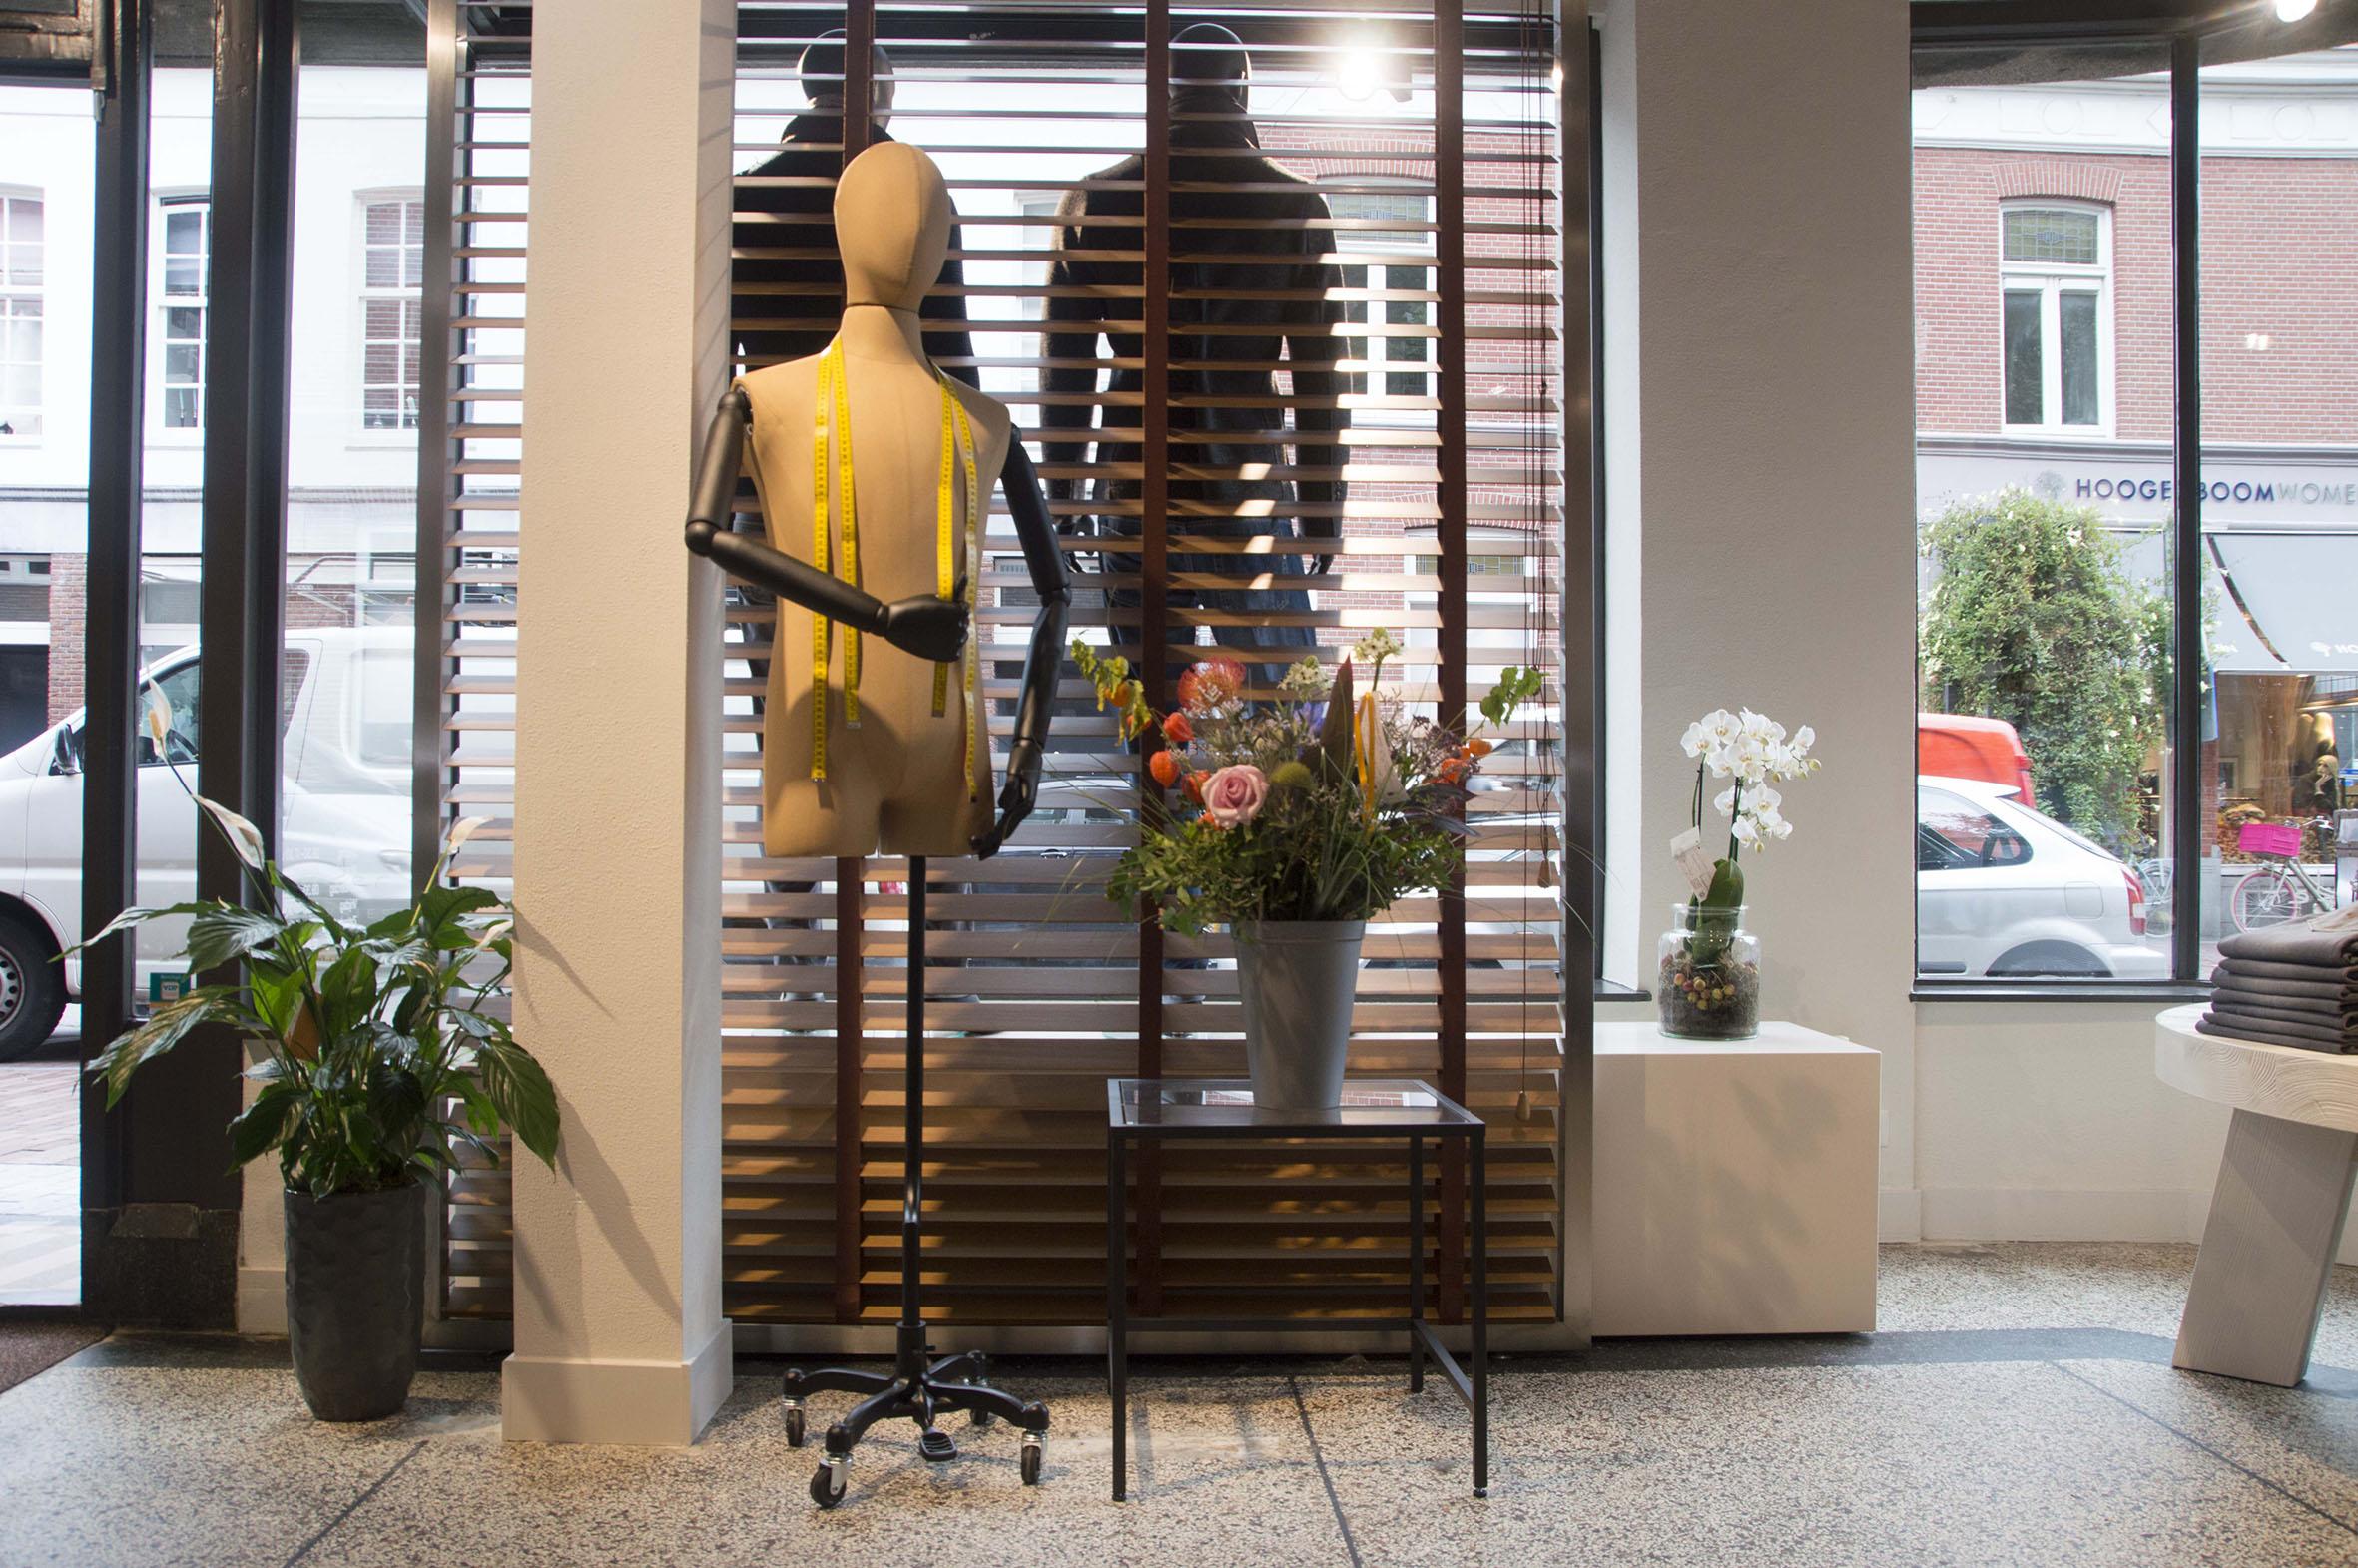 daisy-vd-heuvel-Alexander-M51-Retail-Etalage